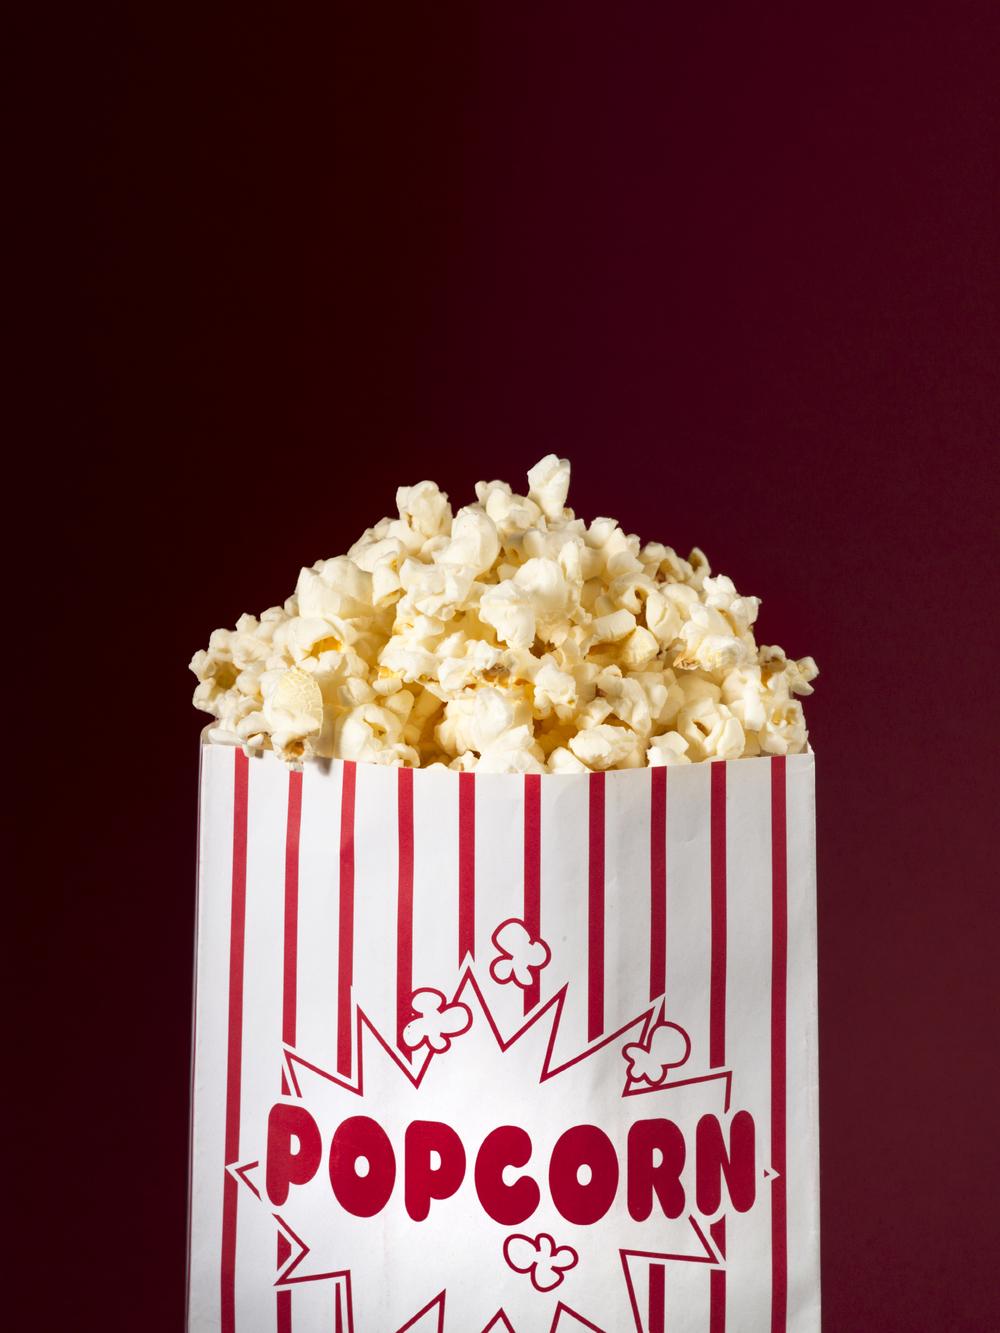 popcorn 13849102_Large.jpg